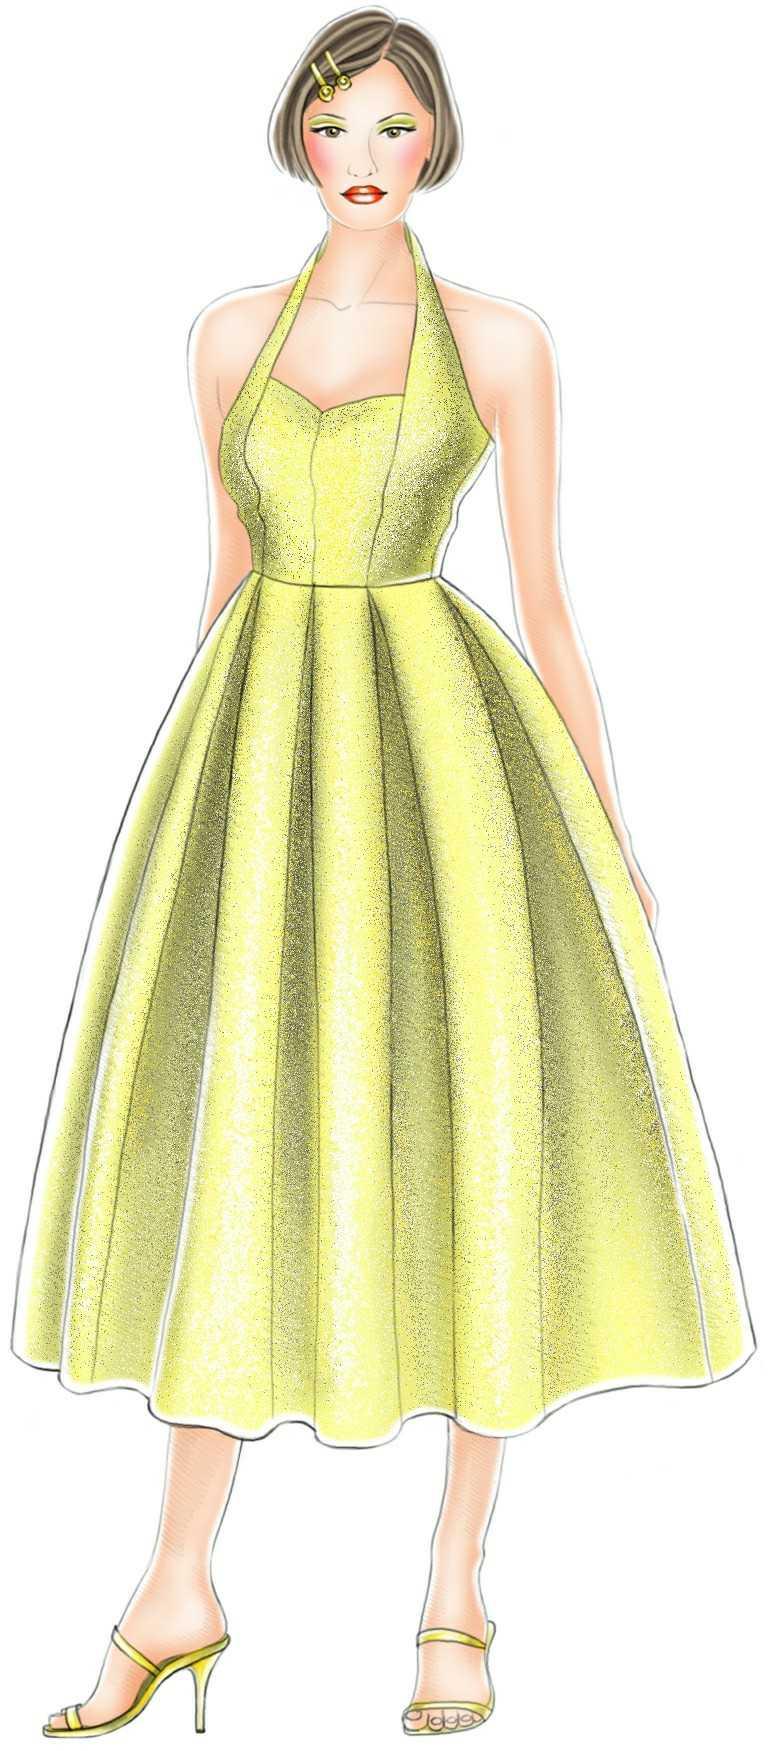 Ball Dress - Sewing Pattern #5195. Made-to-measure sewing pattern ...